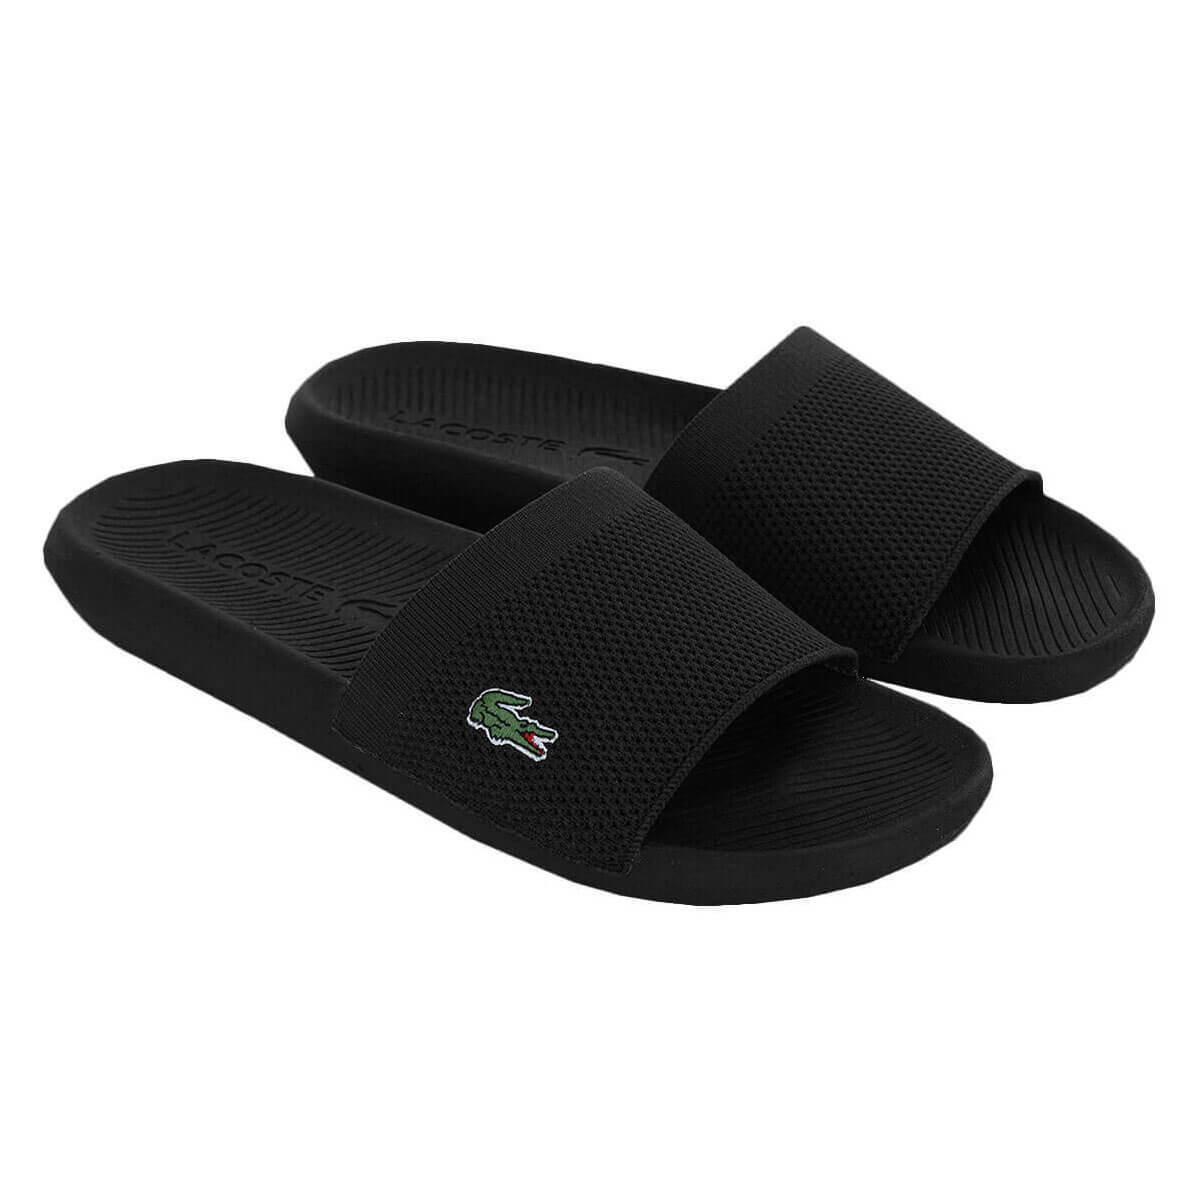 Lacoste-Mens-2019-Croco-Slide-219-2-US-CMA-Flip-Flops miniature 3